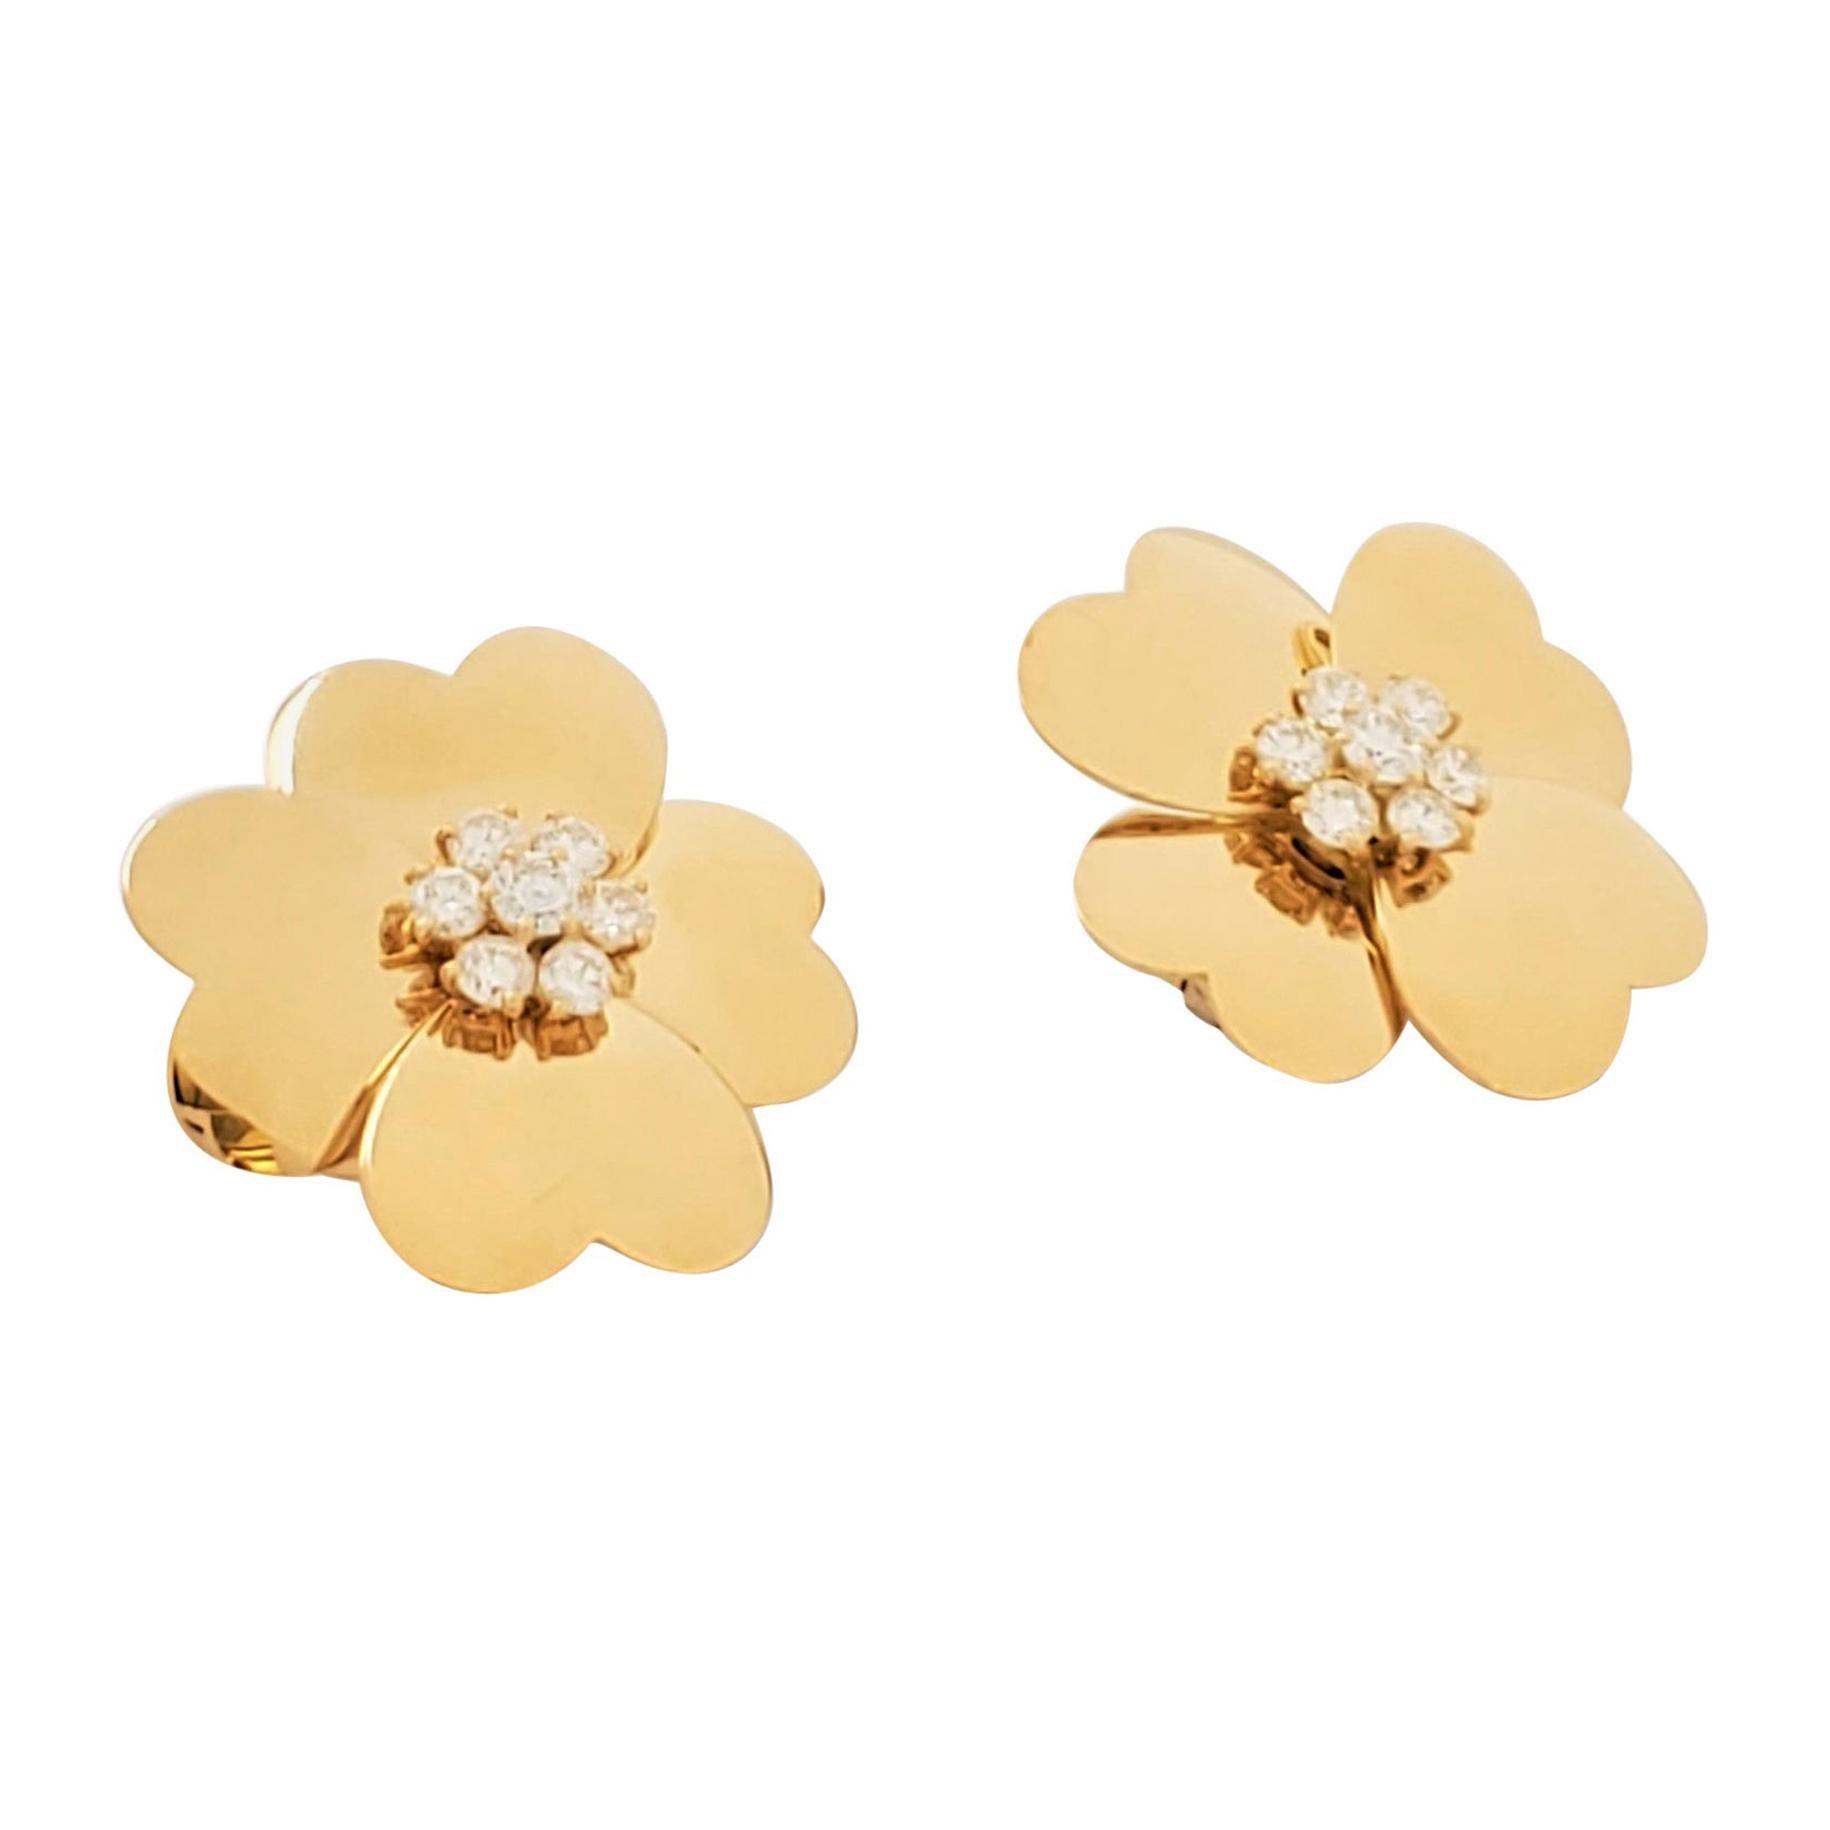 Van Cleef & Arpels 'Cosmos' Yellow Gold and Diamond Earrings